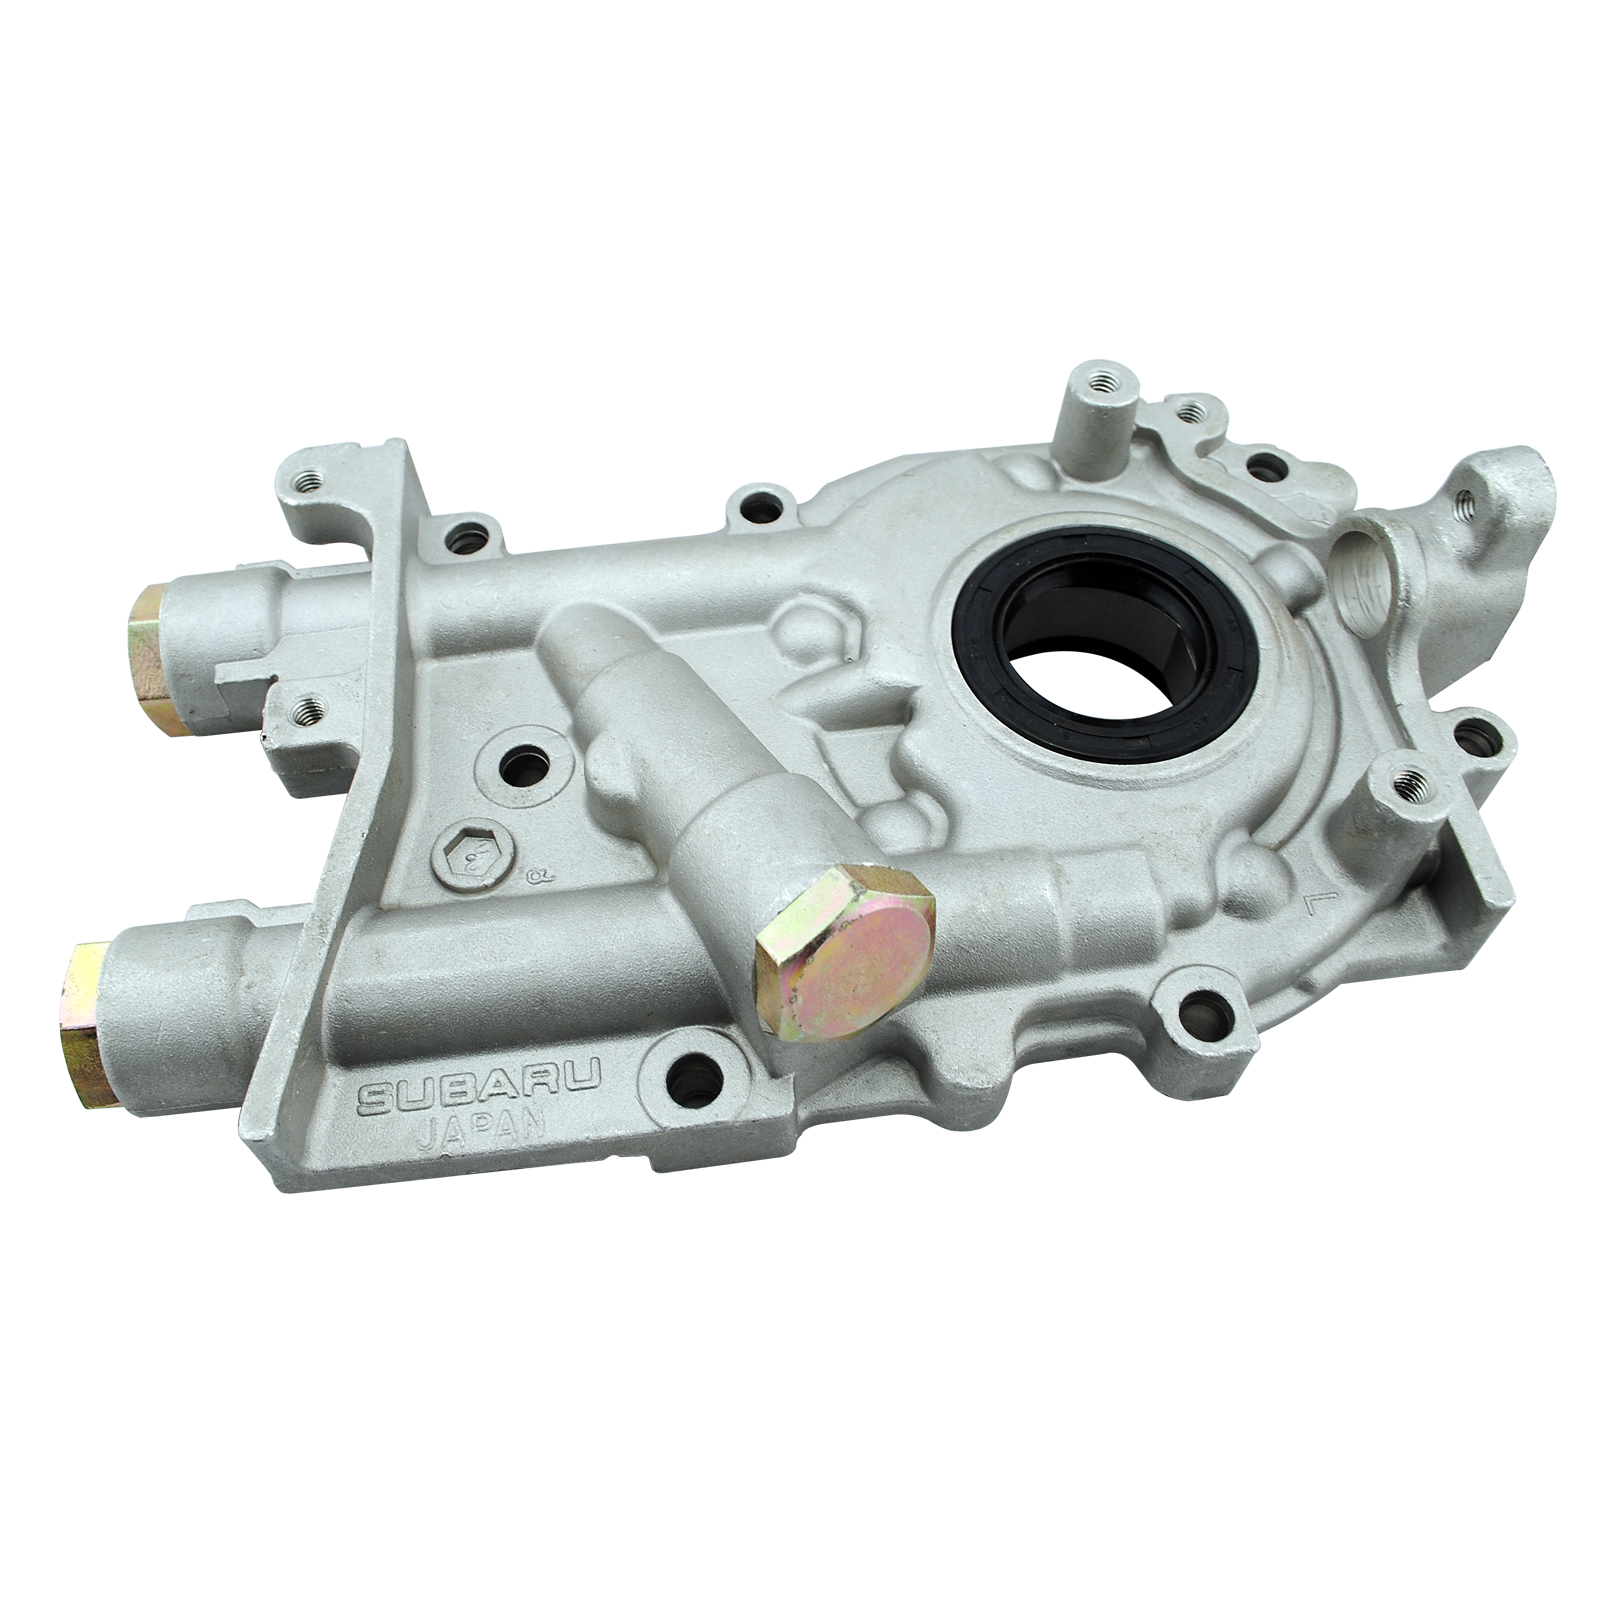 10mm subaru oil pump forester impreza legacy outback ej18 for Subaru forester motor oil